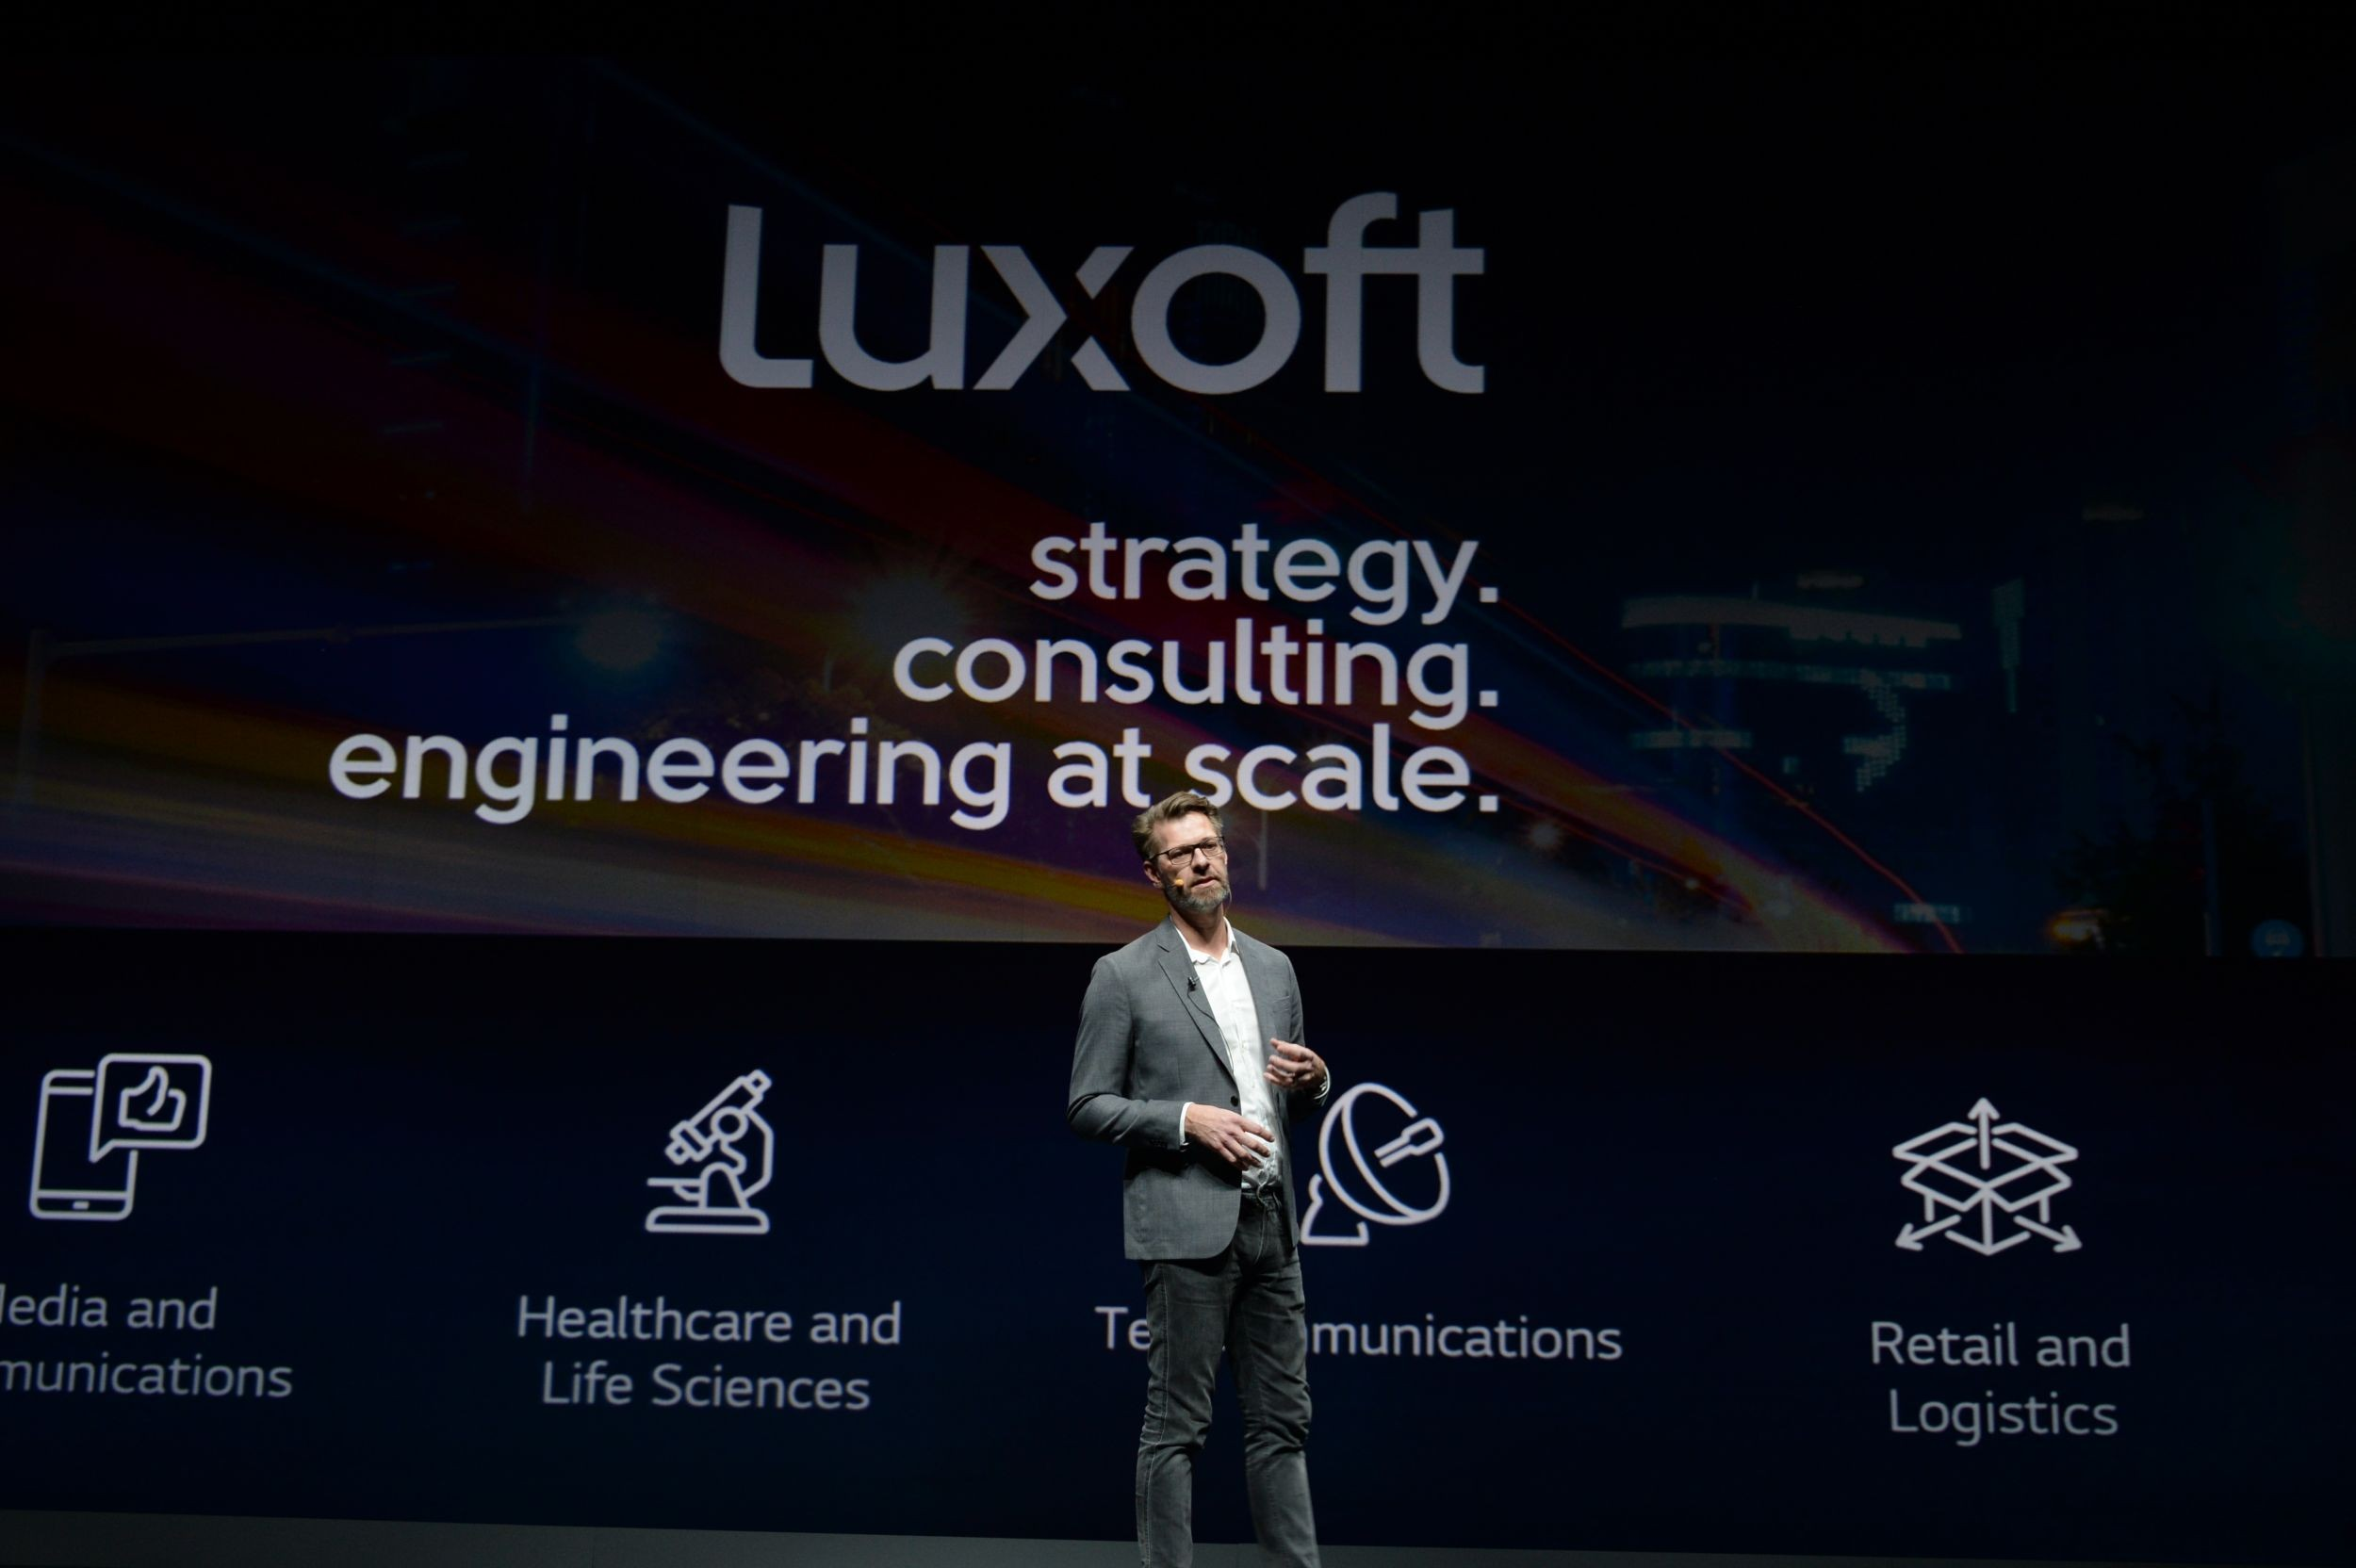 Mr. Alwin Bakkenes, managing director of automotive at Luxoft, delivers the keynote address.